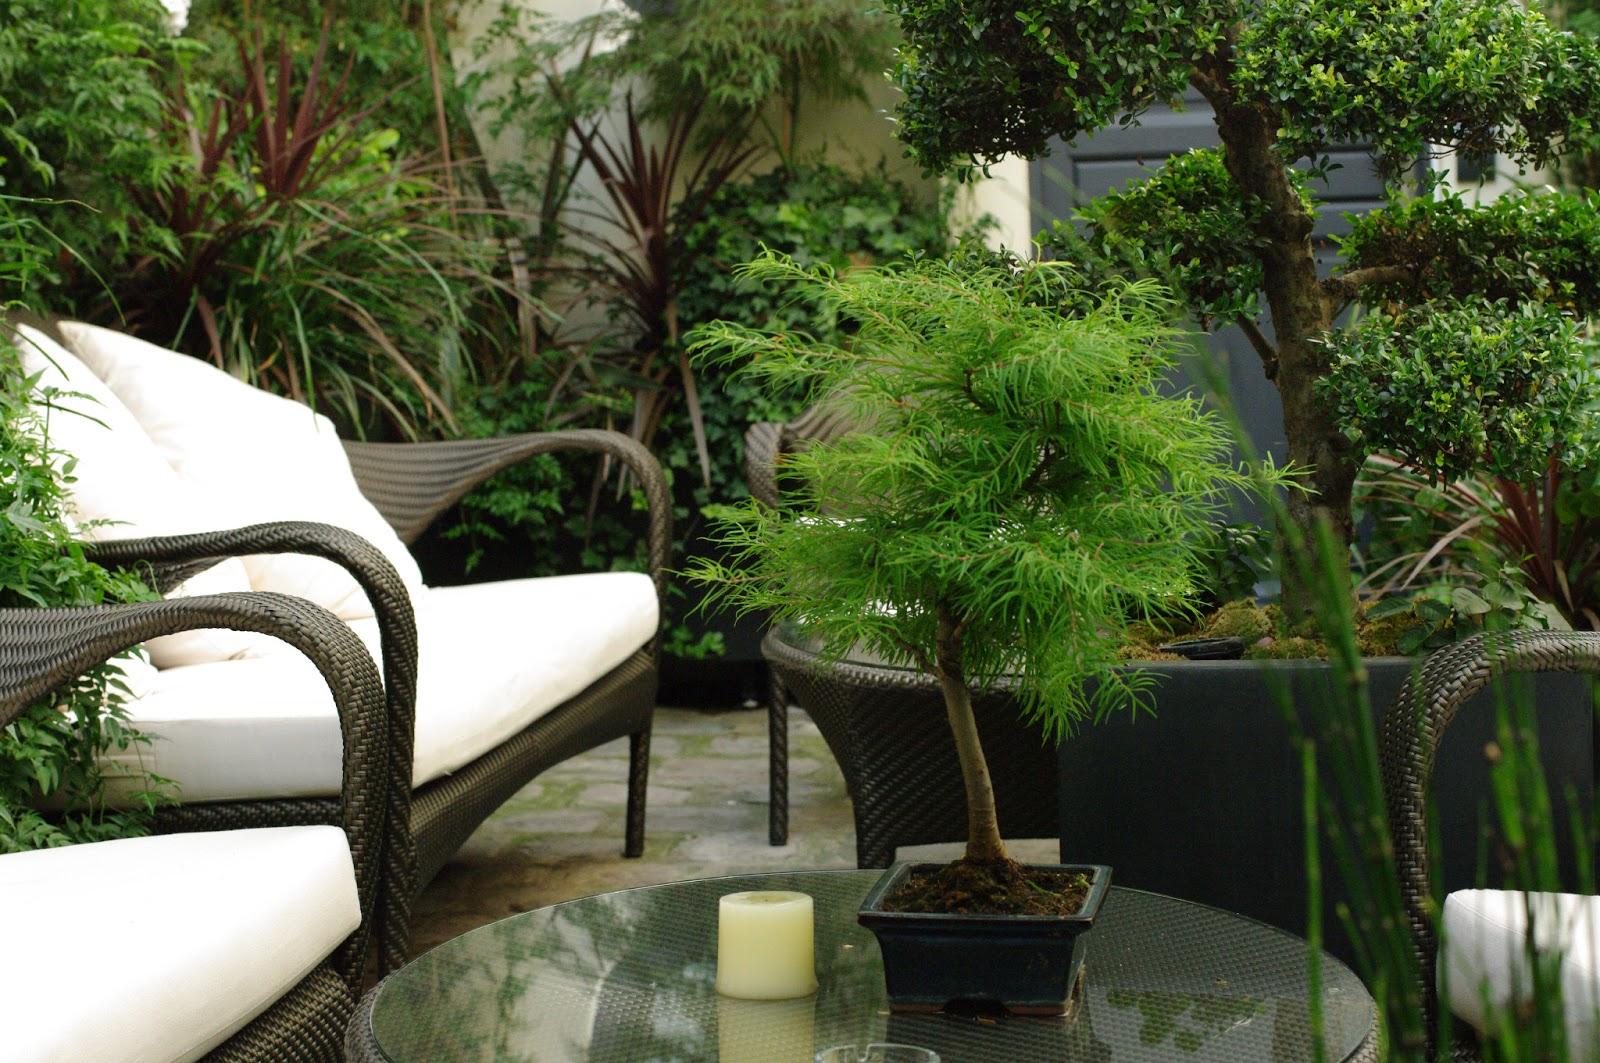 Paradis express hotel villa madame paris for Hotel villa jardin tultitlan